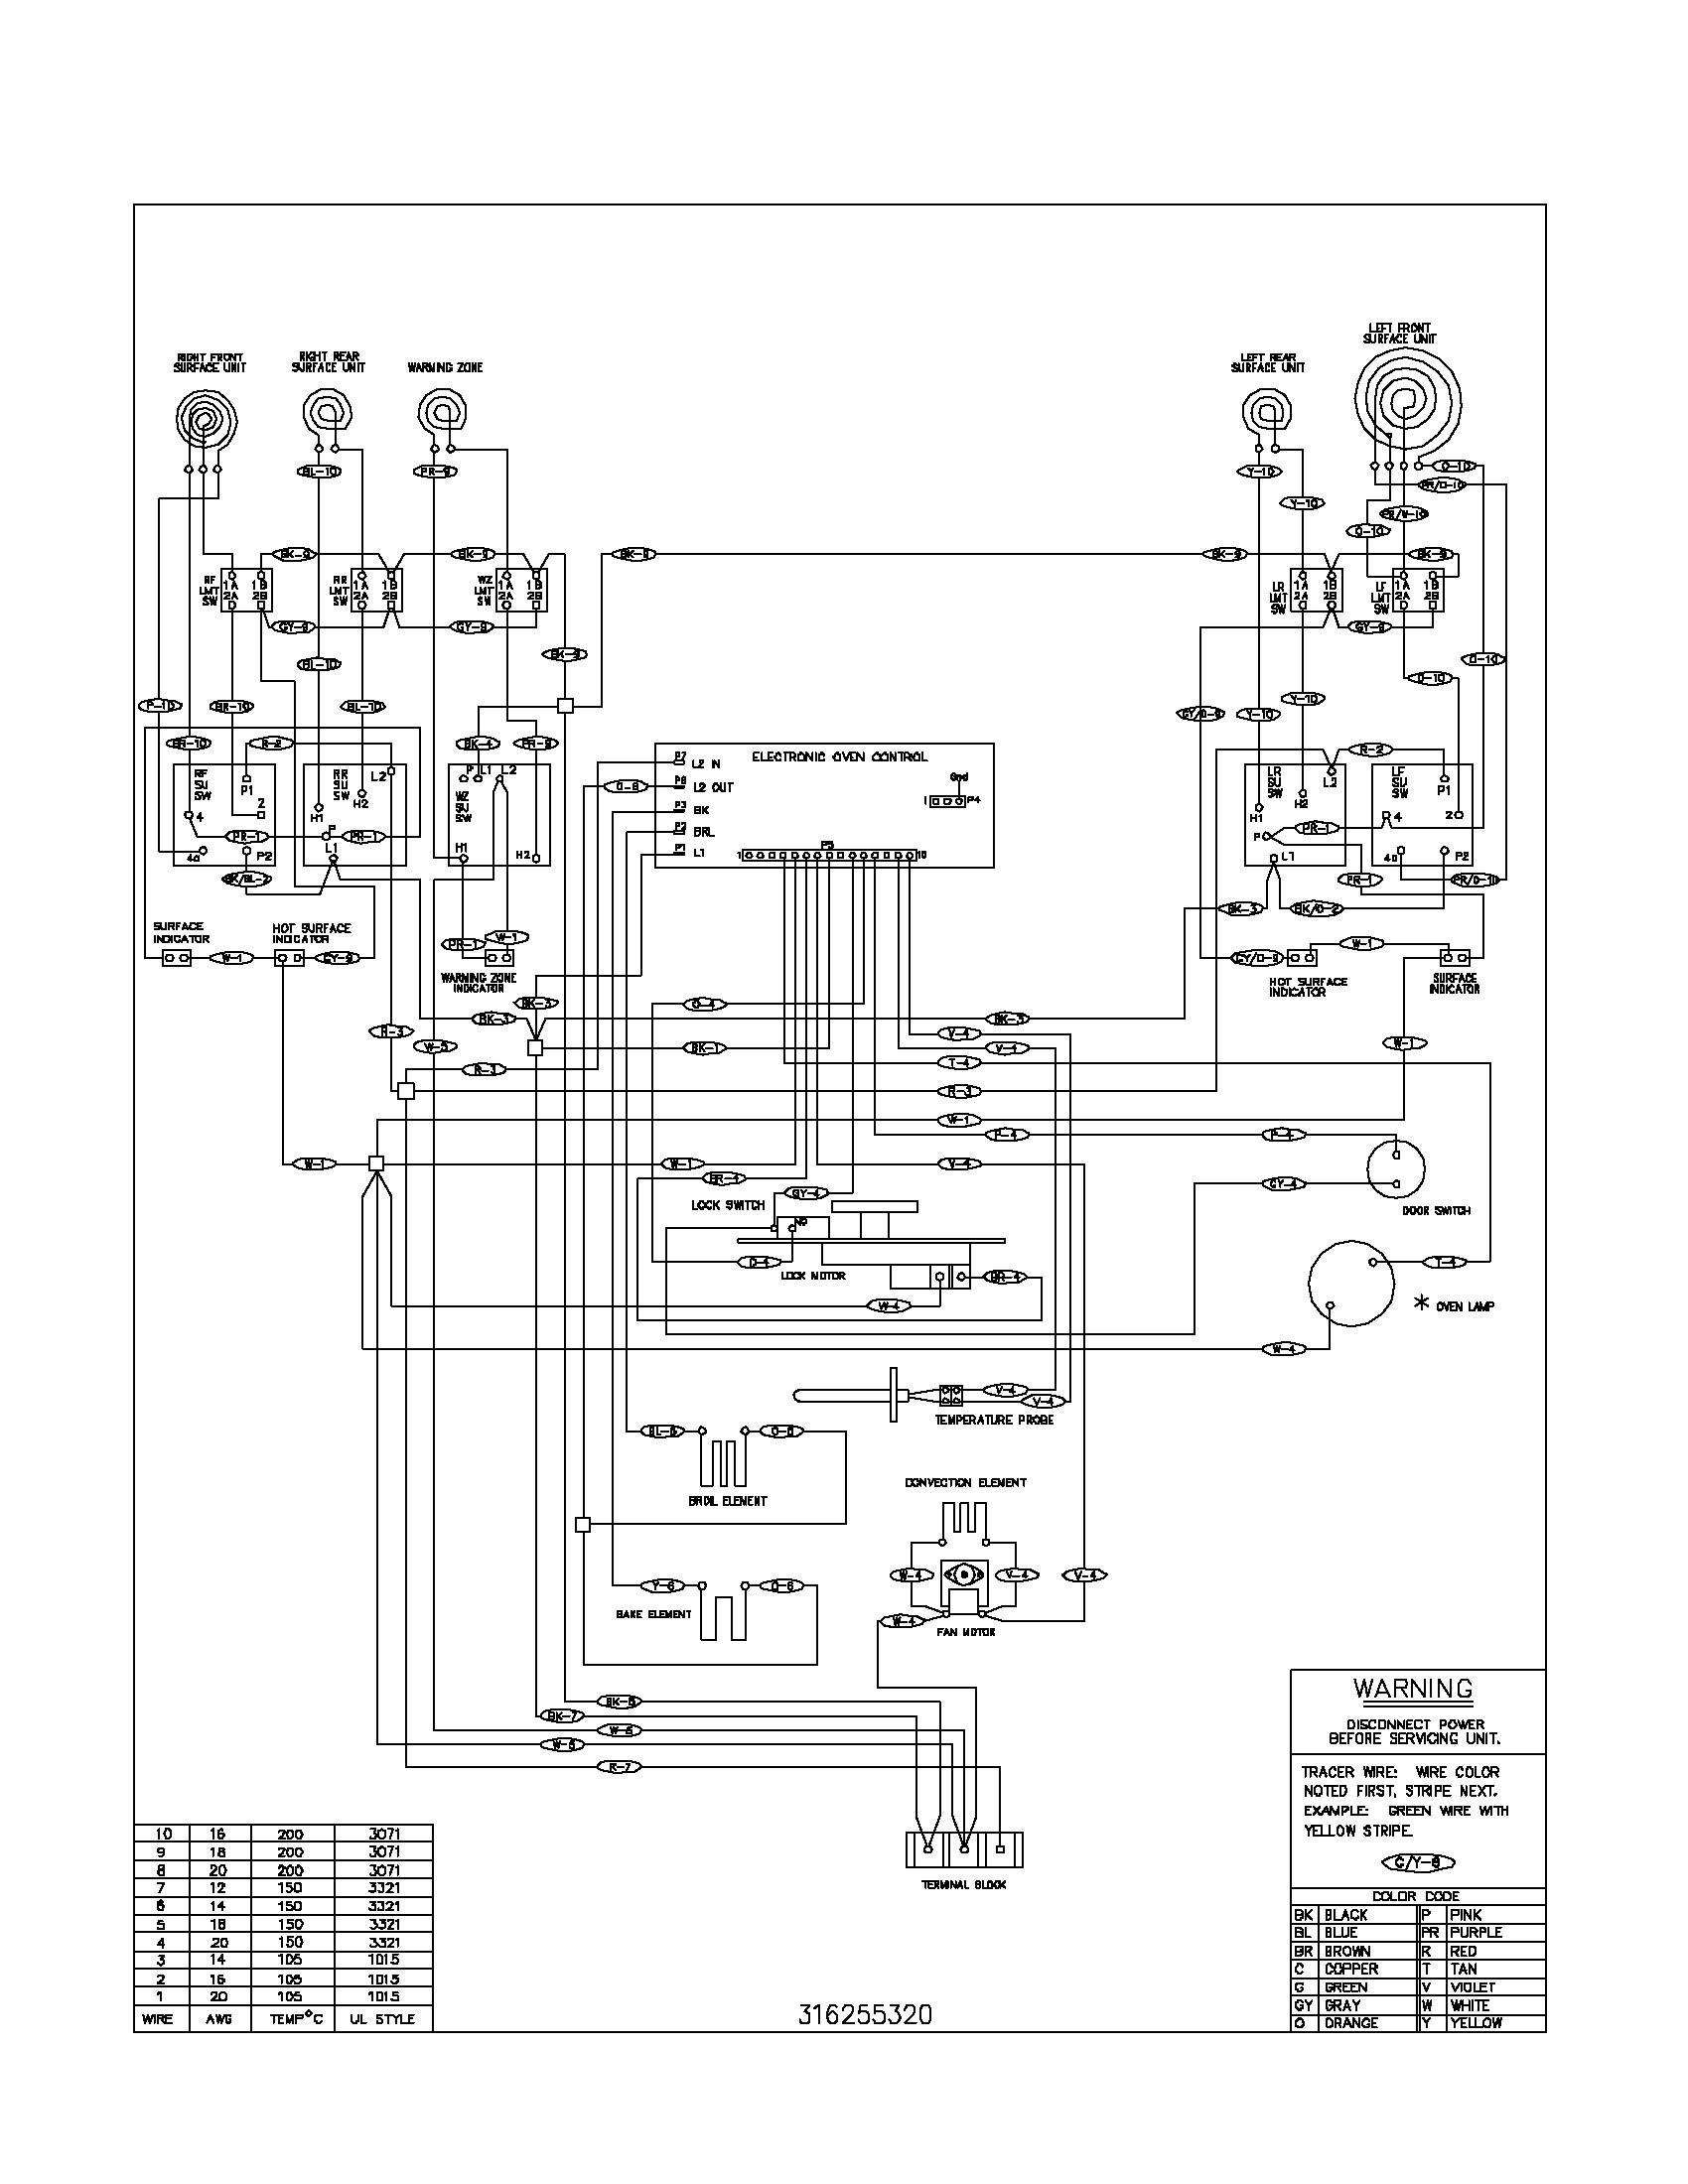 electric range wiring diagram frigidaire 316455400 car wiring rh ethermag co frigidaire stove wiring diagram